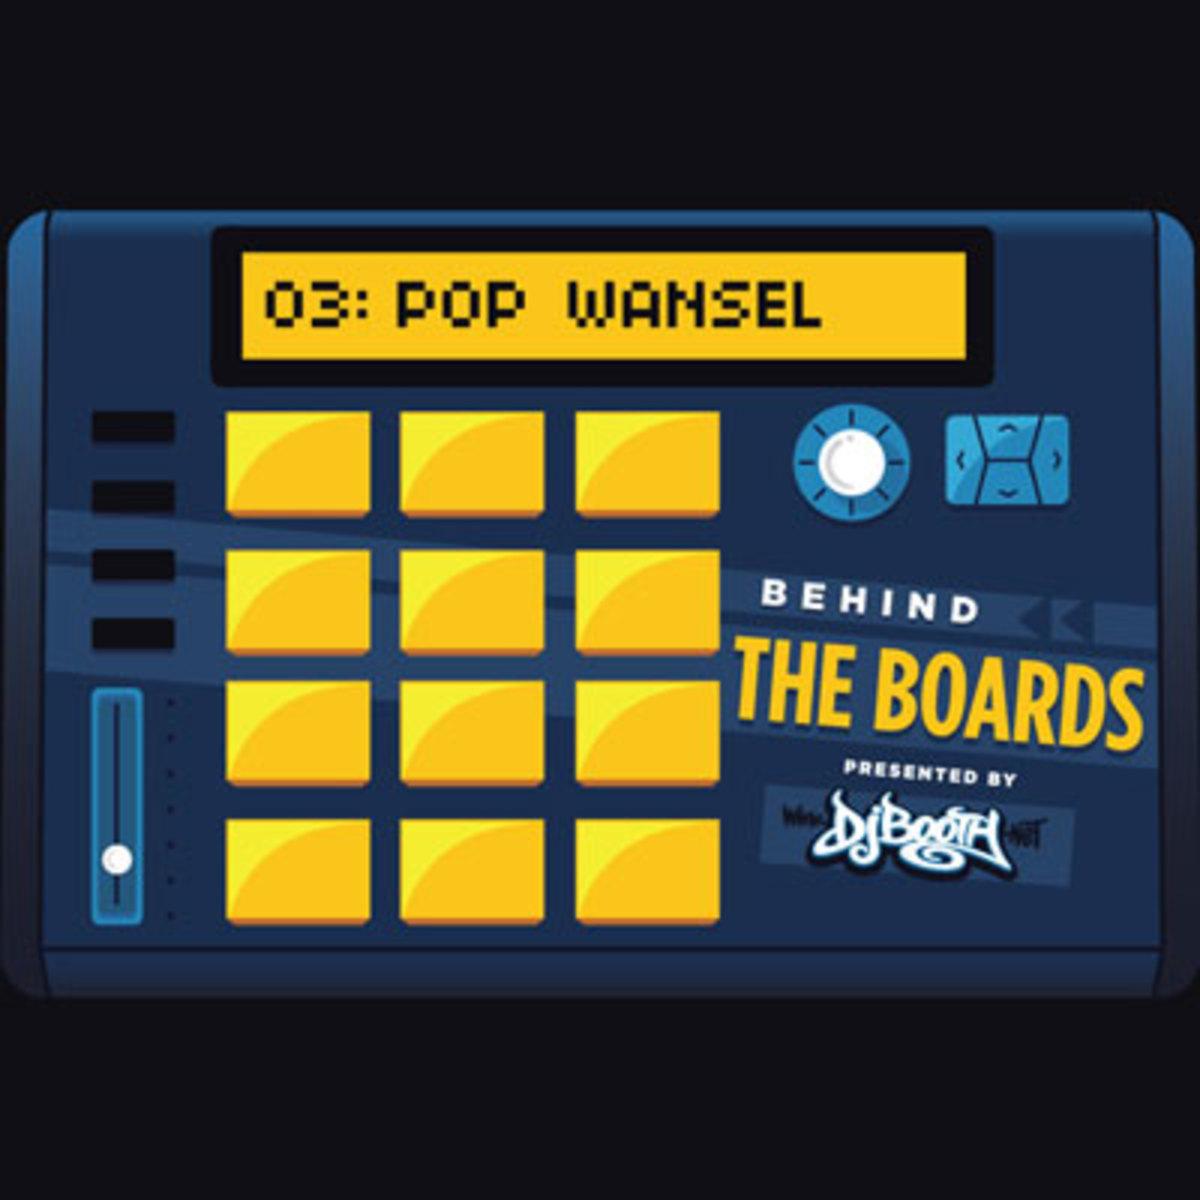 behindtheboards-popwansel.jpg